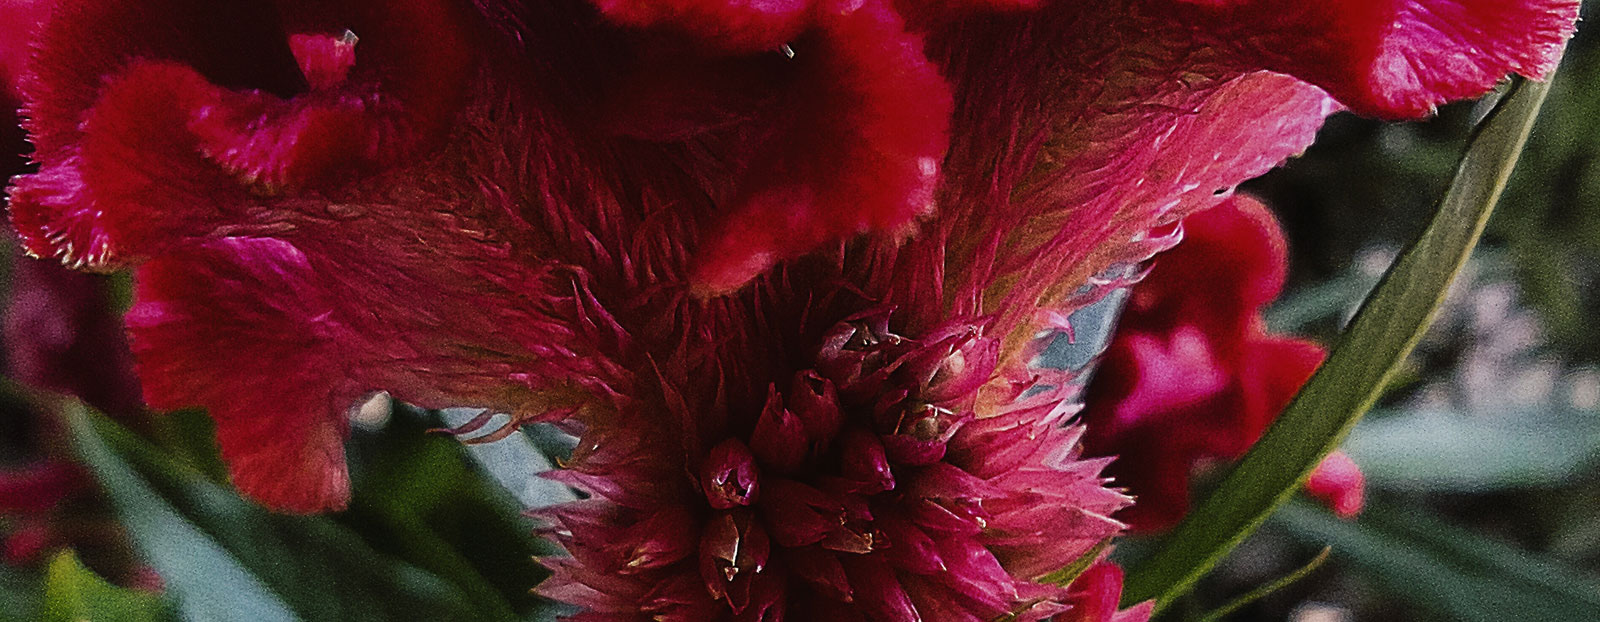 Celosia in its natural habitat